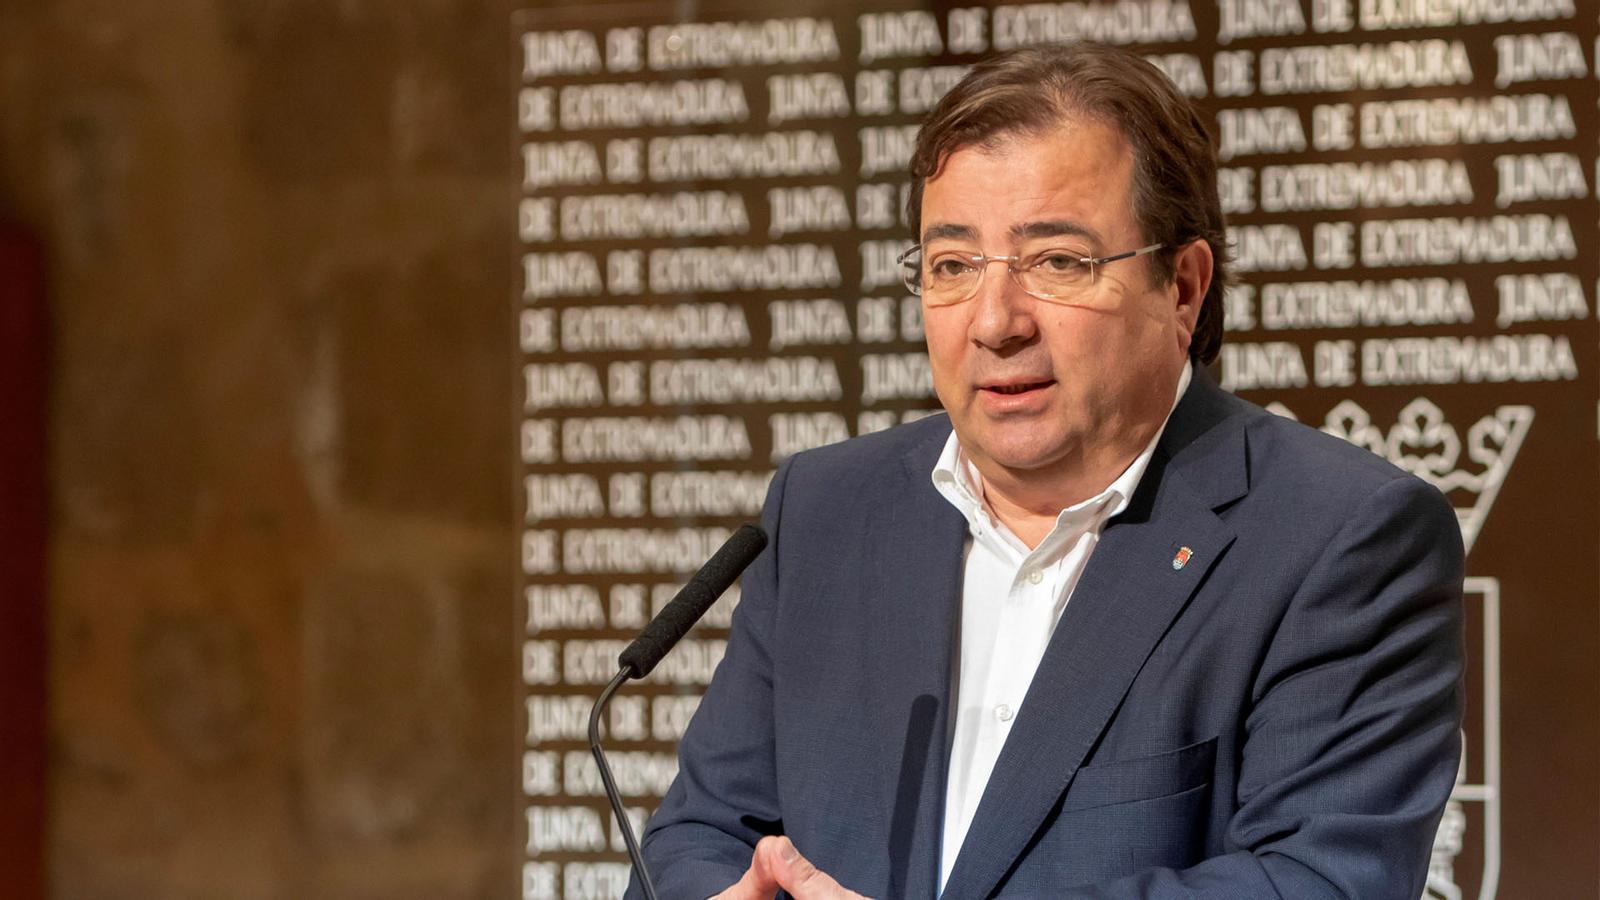 L'anàlisi d'Antoni Bassas: 'Fernández Vara: VD. se contradice'